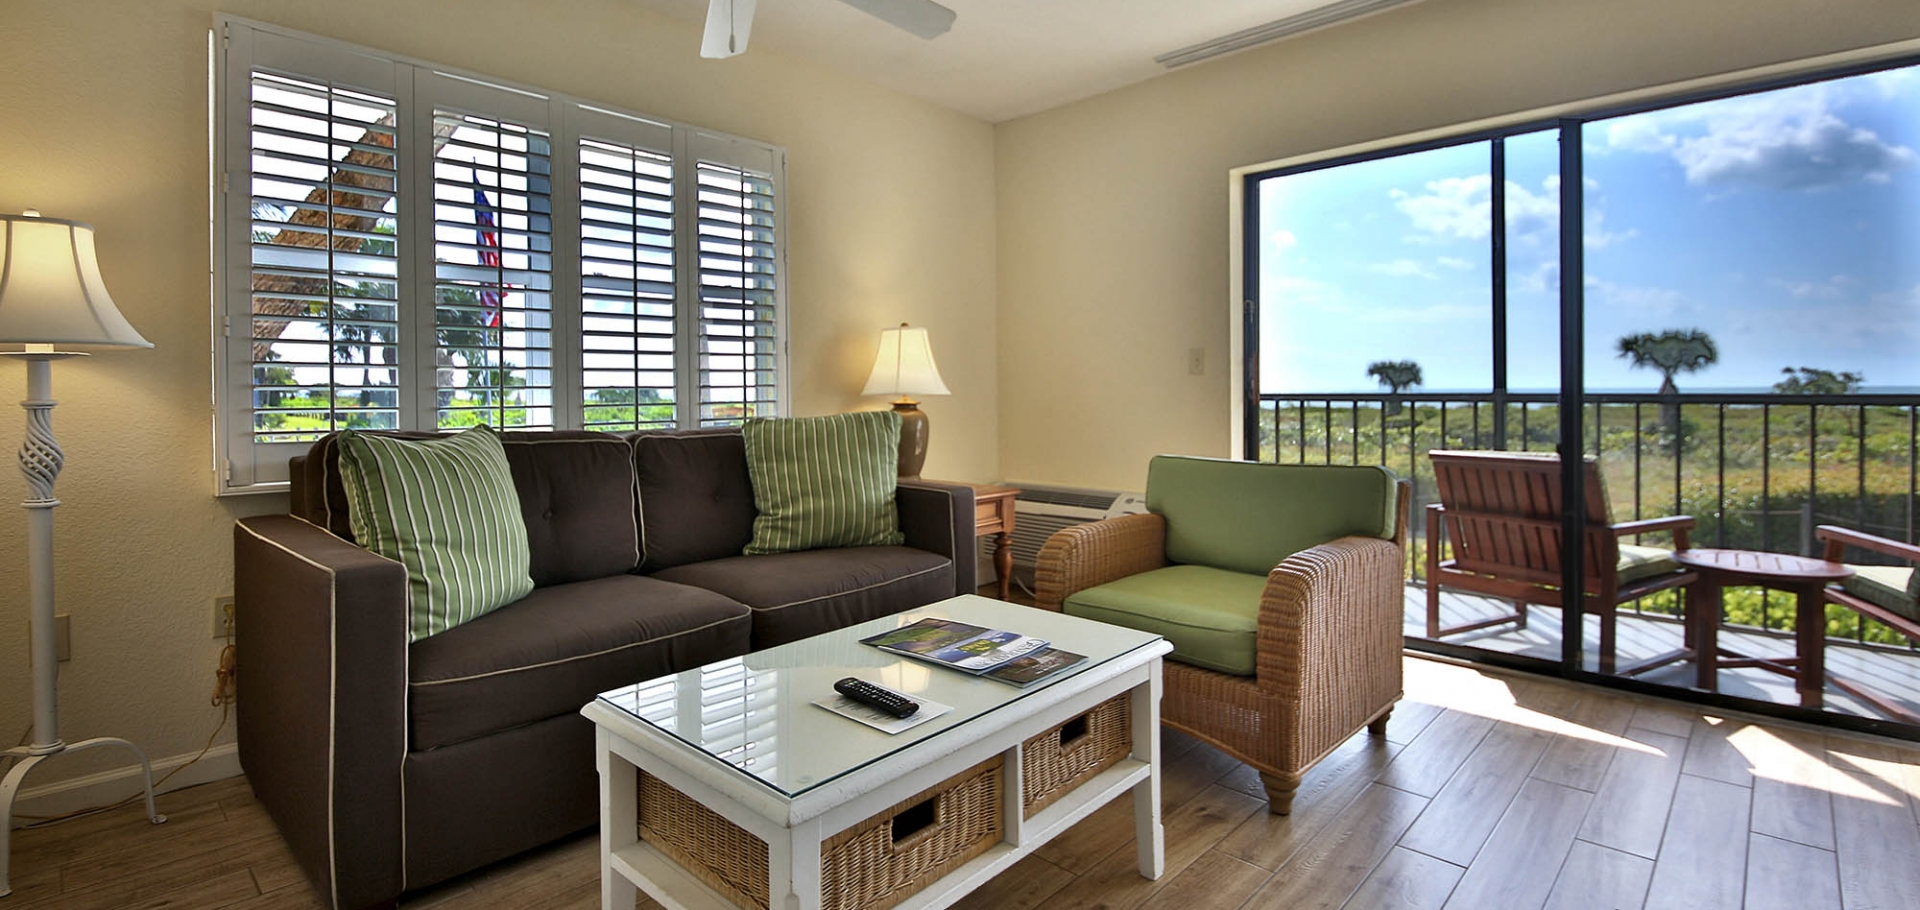 Sanibel Inn guest room sitting area